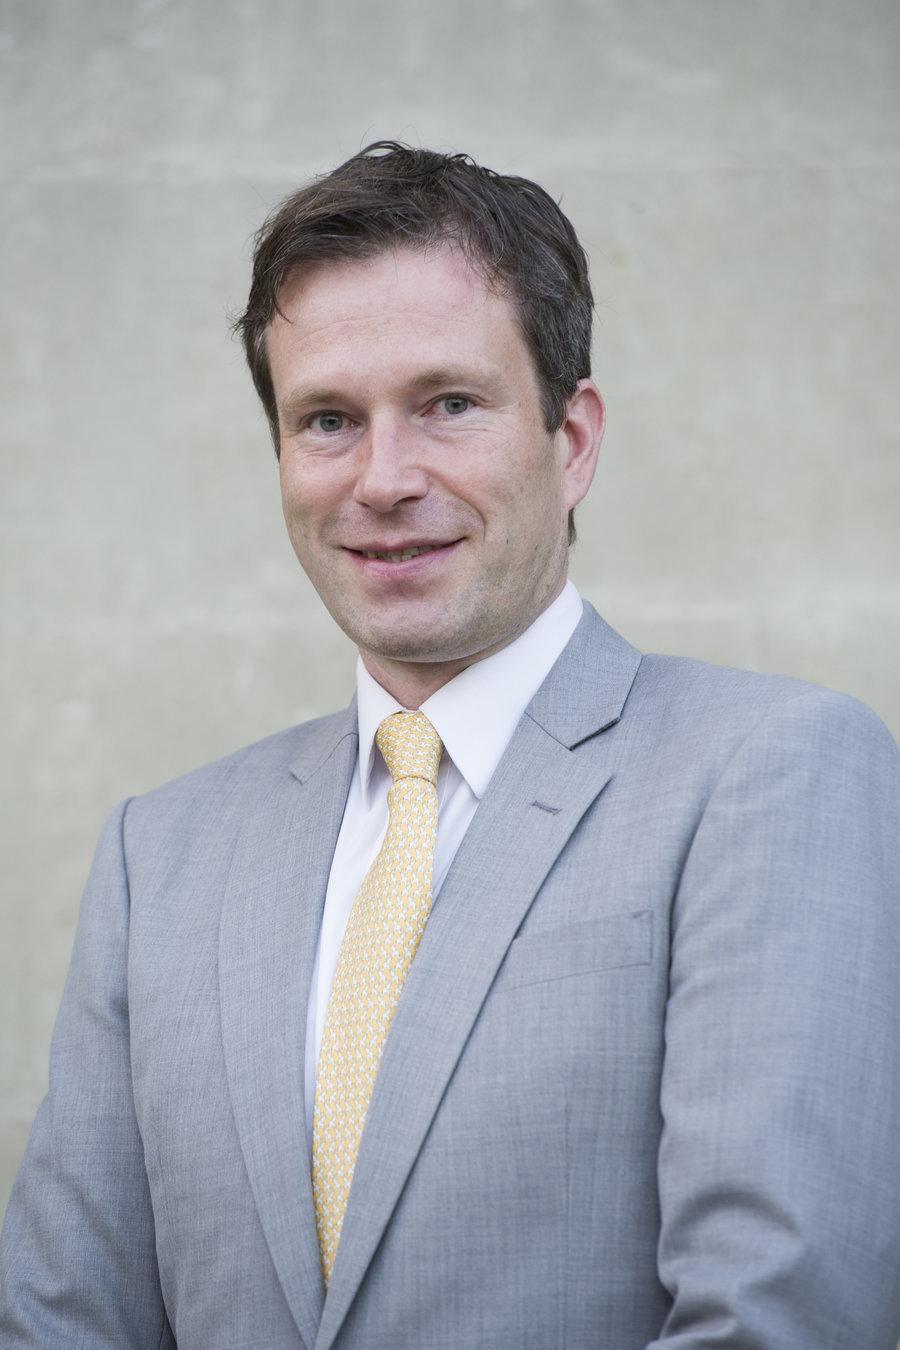 Frank Moser, Schriftführer des VDBIO